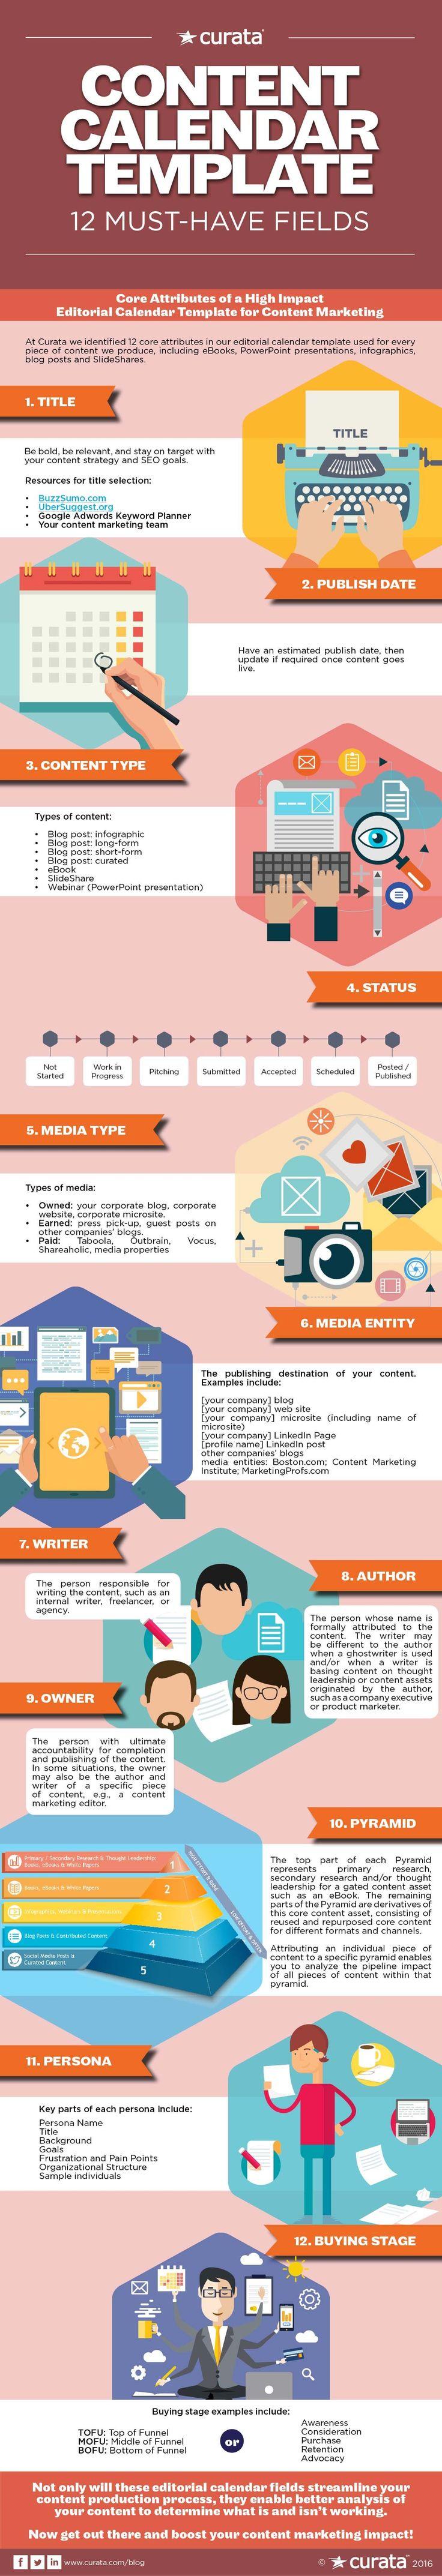 Content Marketing Calednar Infogrpahic1